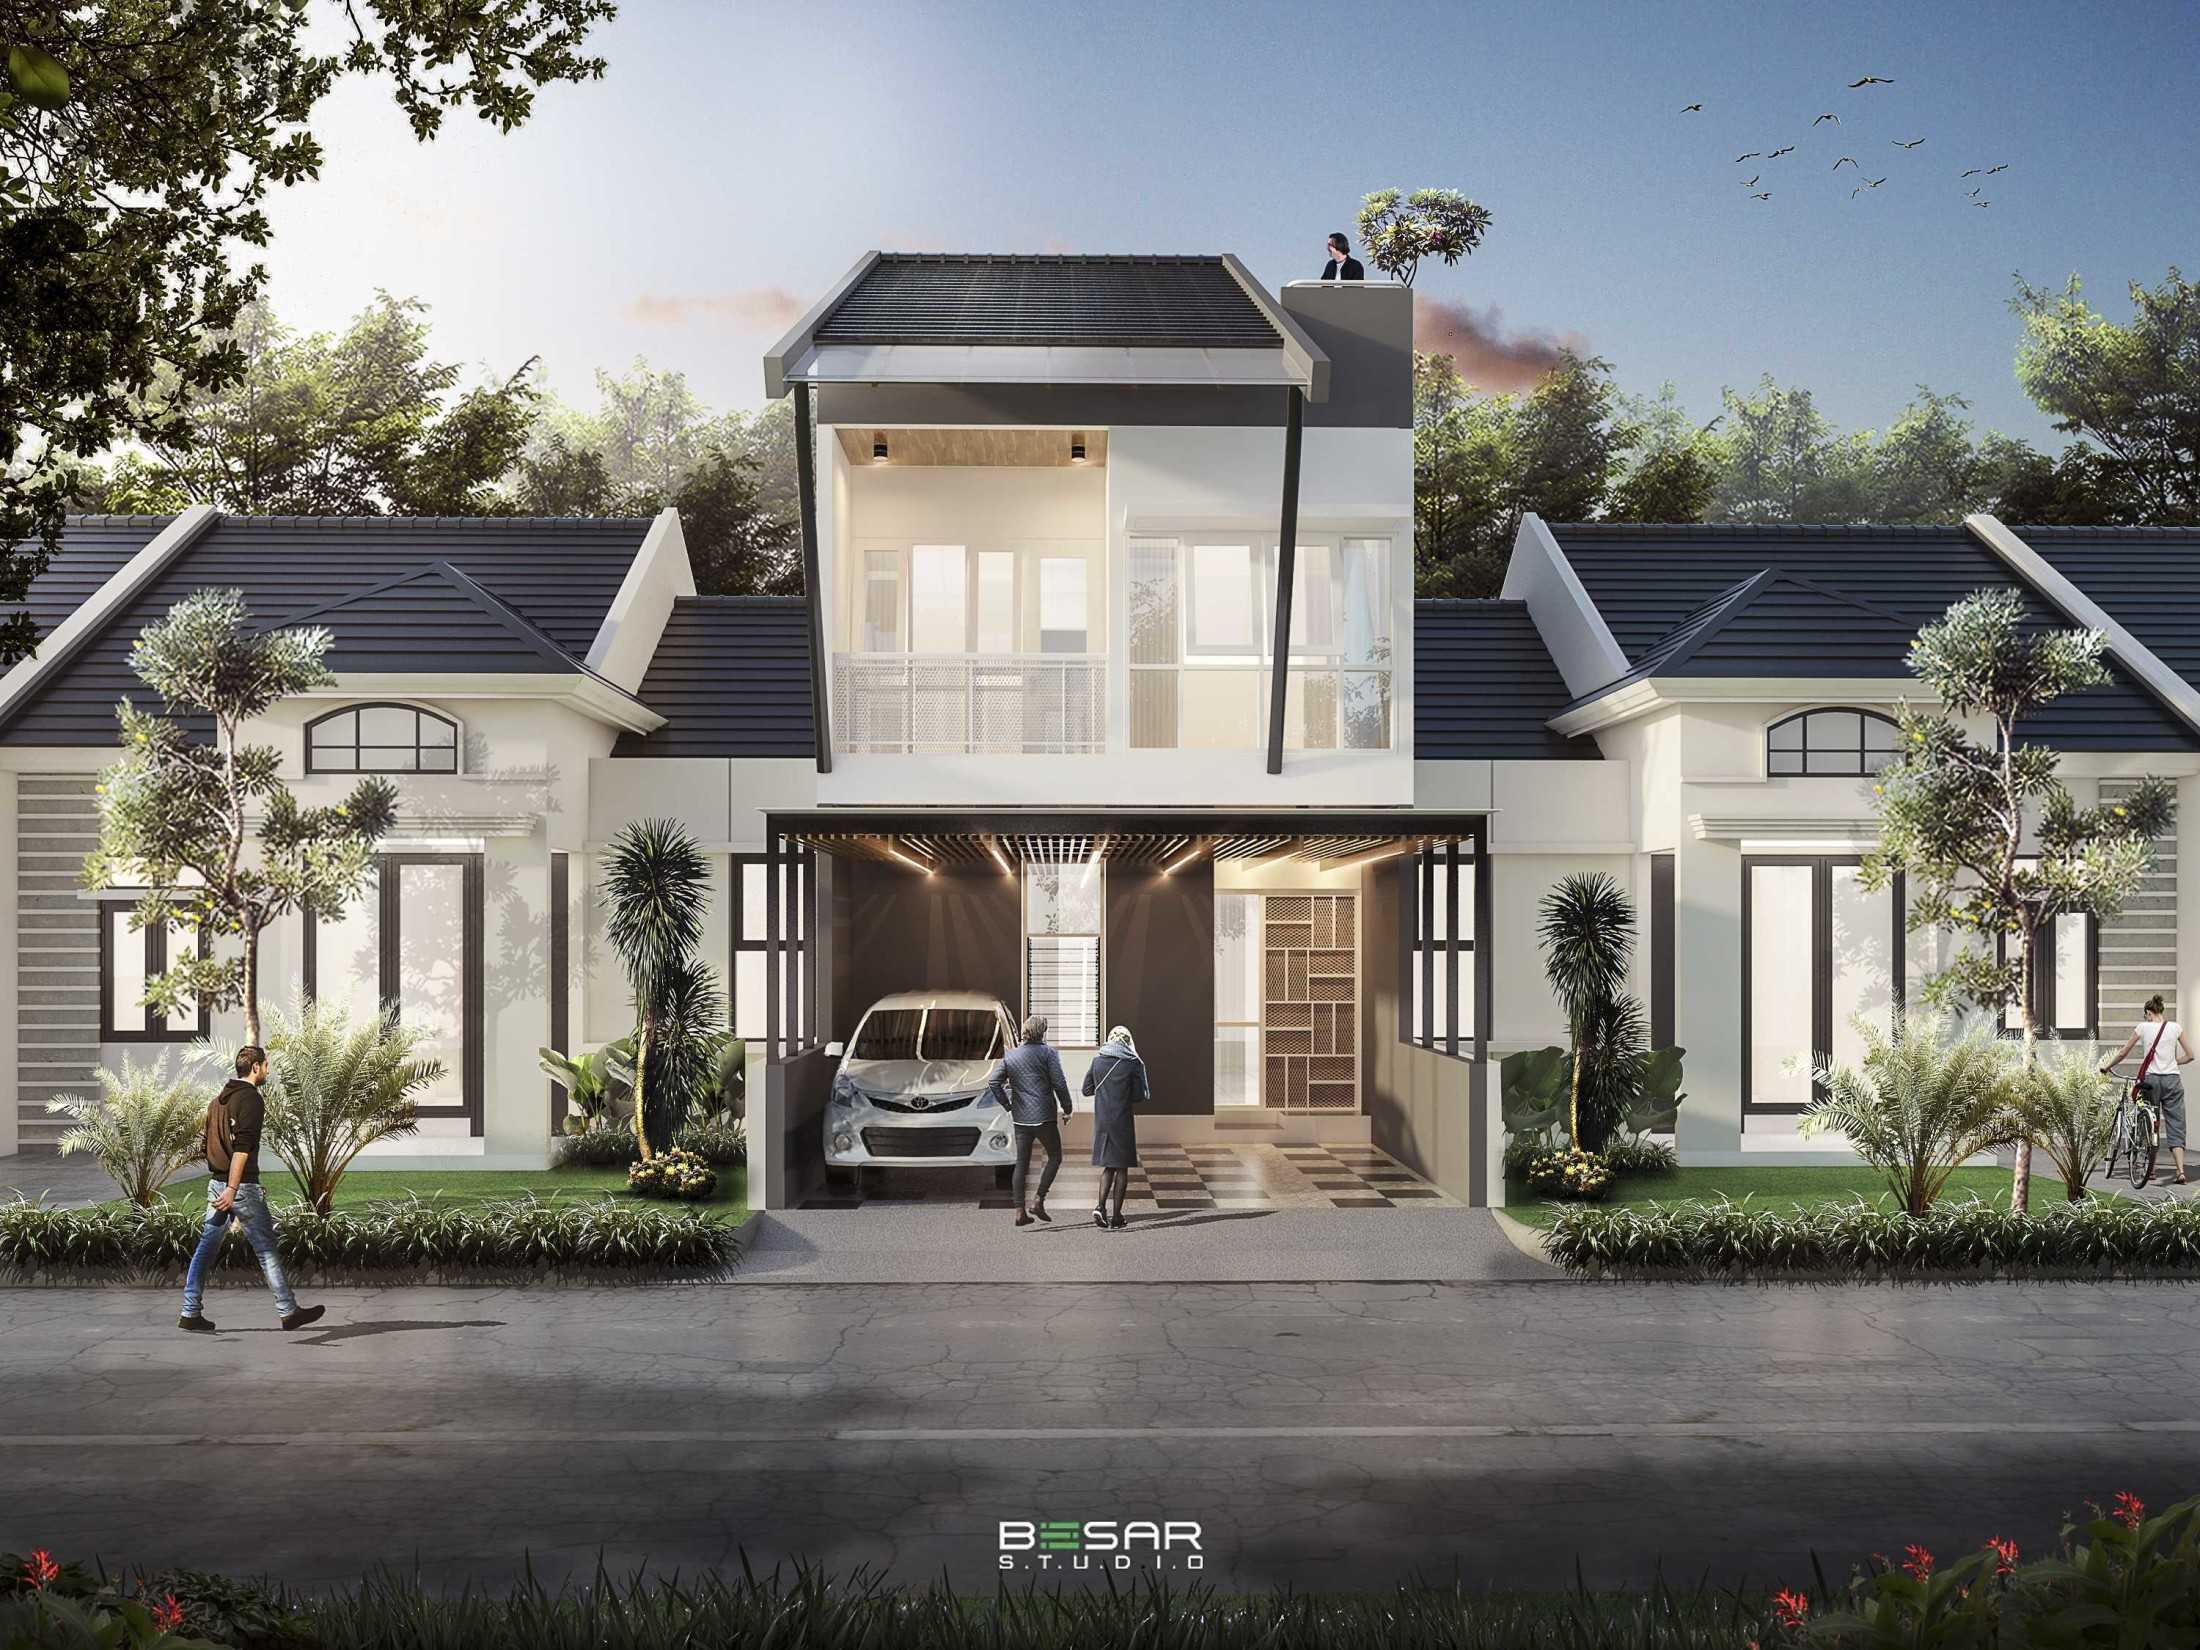 Studio Besar R-House, Cikarang Cikarang Utara, Bekasi, Jawa Barat, Indonesia Cikarang Utara, Bekasi, Jawa Barat, Indonesia Studio-Besar-R-House  60030